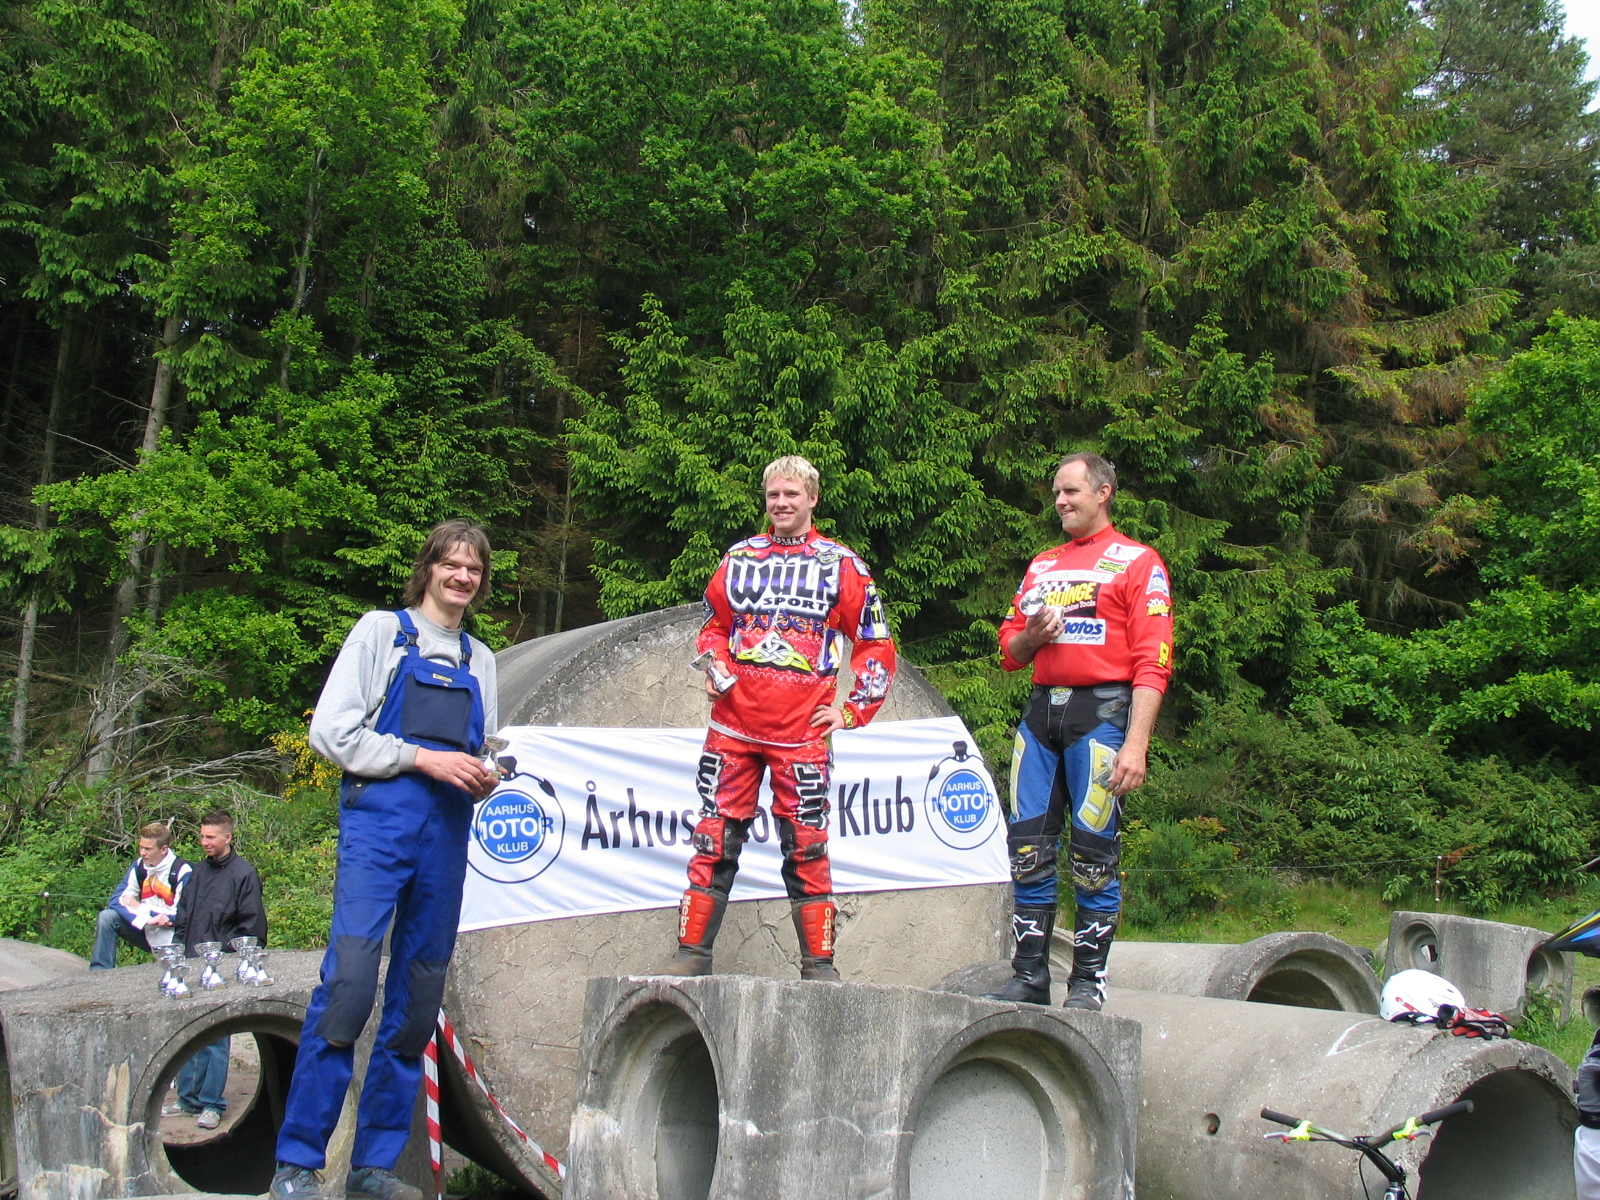 Kasper Thulstrup vandt foran Torben Pedersen. Jens Peder tv